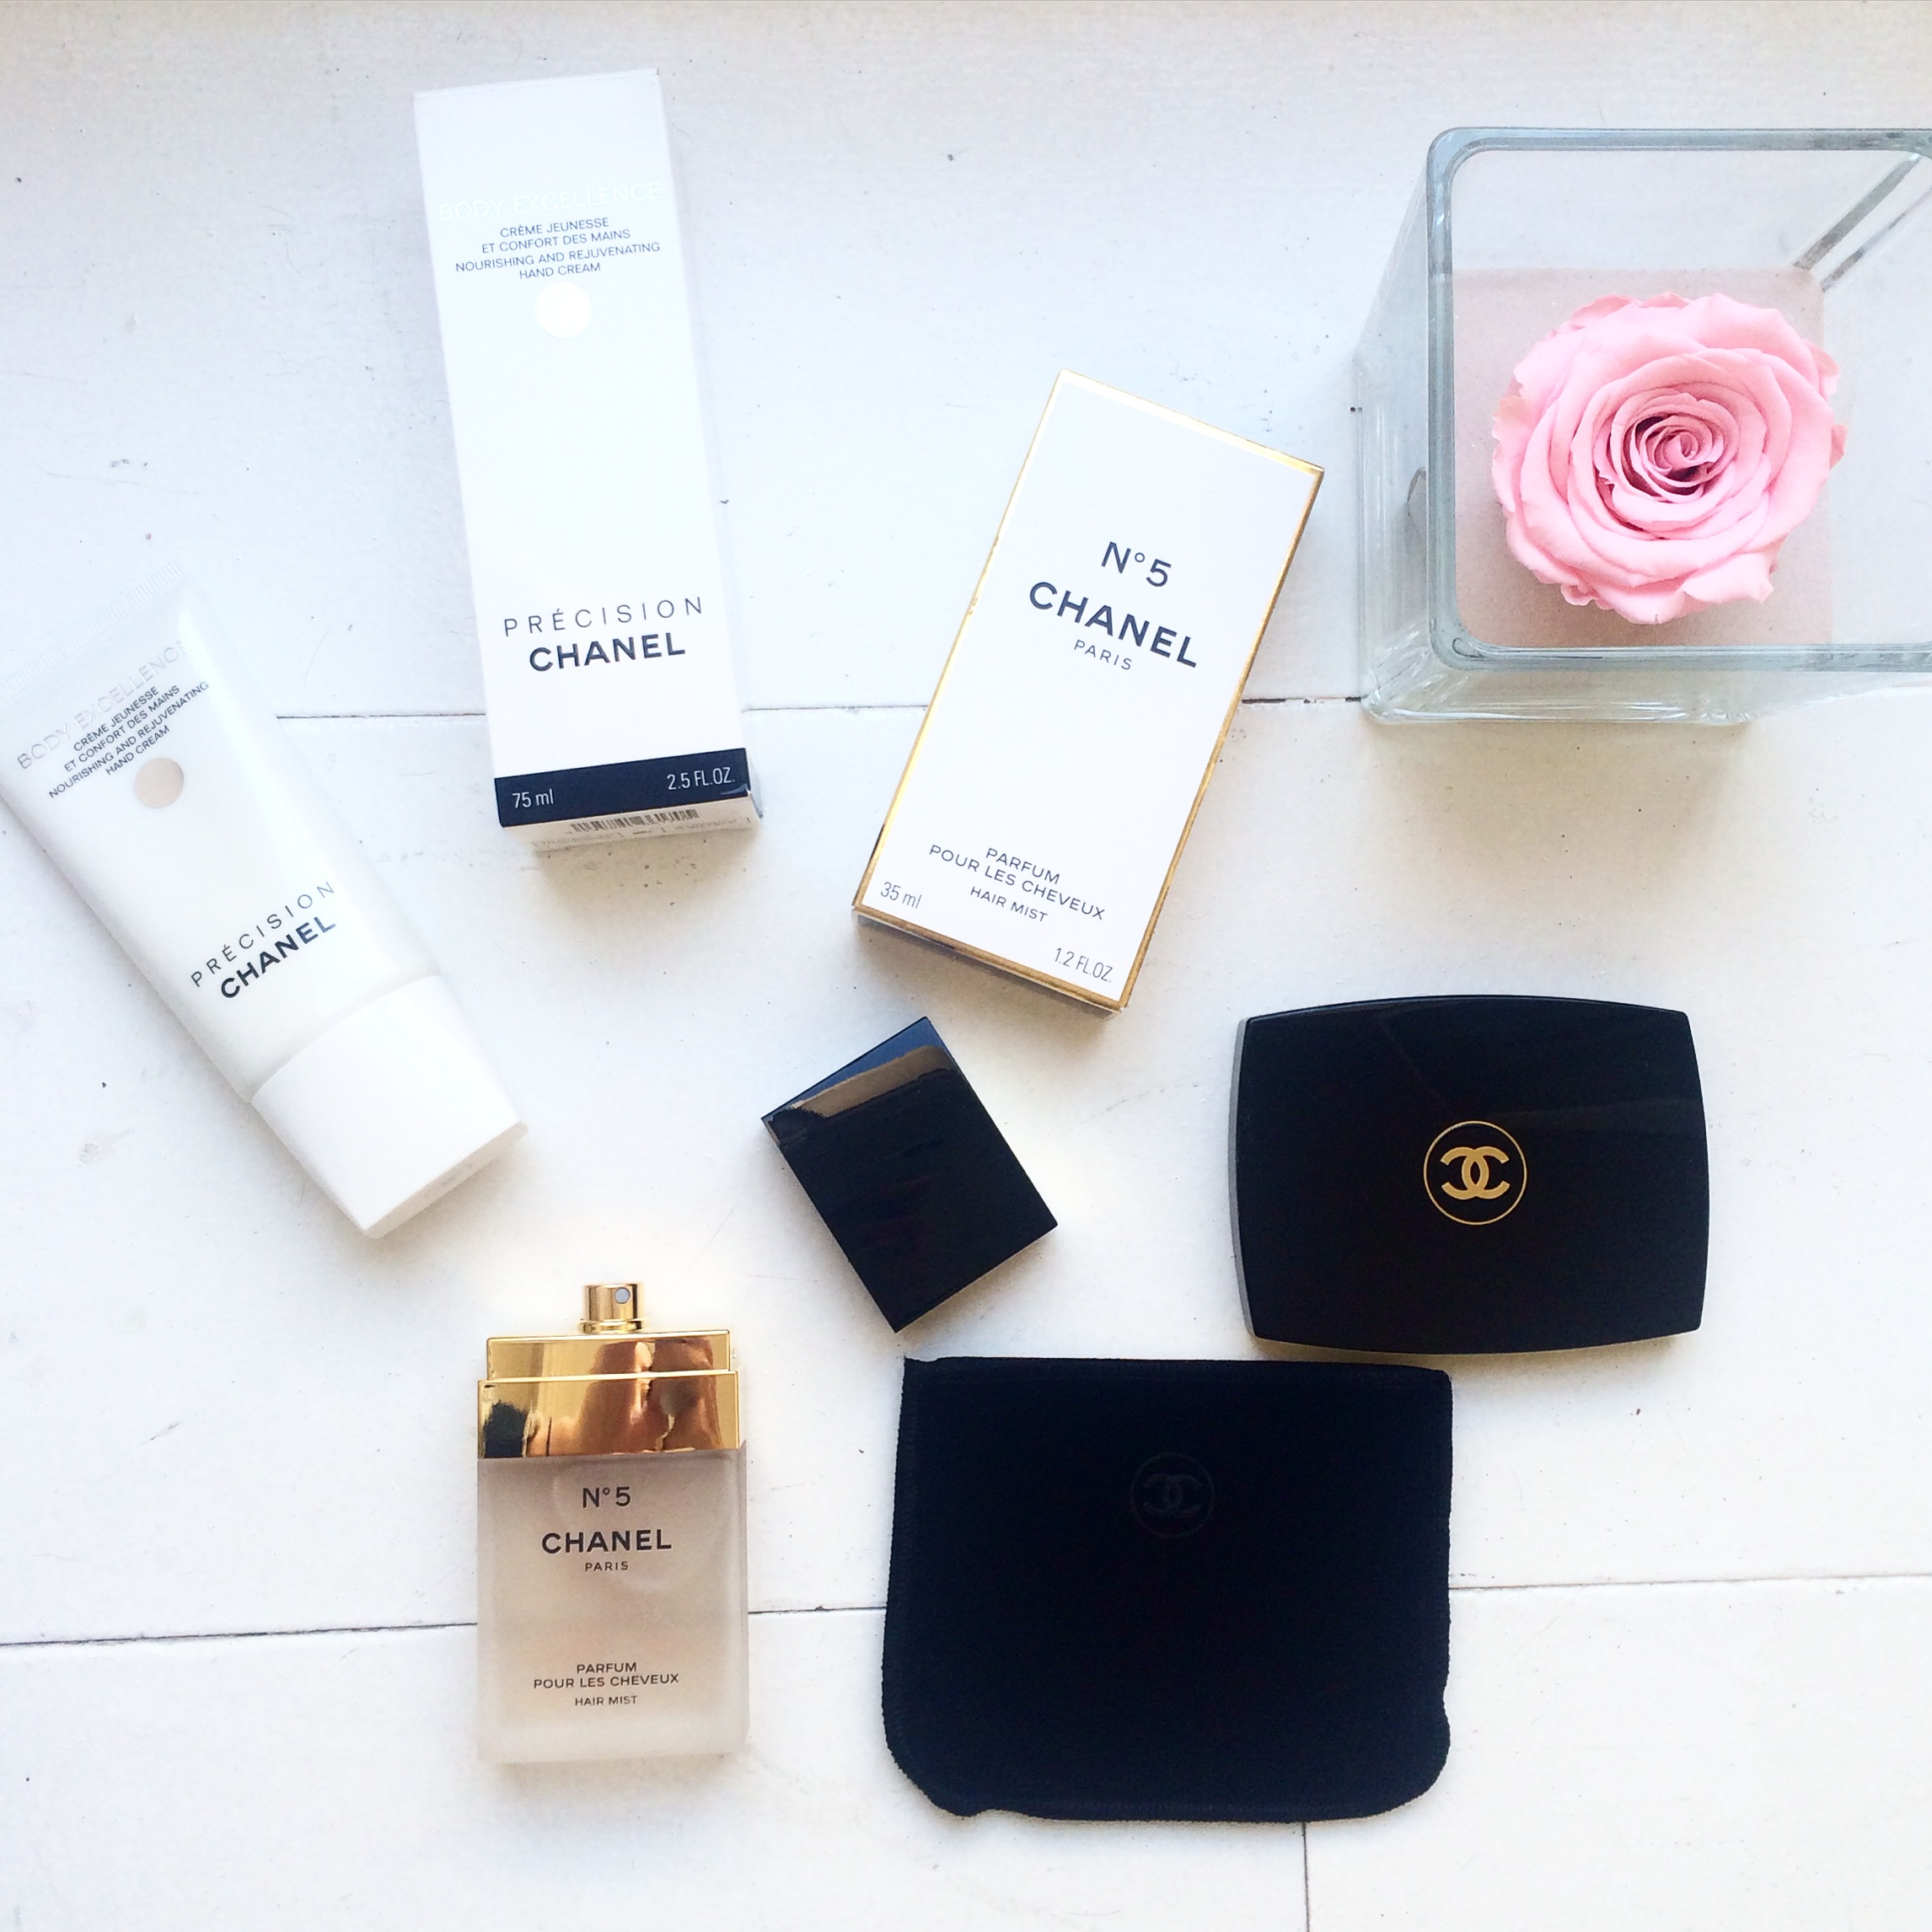 Instamoments_Bymyheels_Instagram_Fashion_Blogger_Lara_Martin_Gilarranz_Blog_de_Moda_Femenina_y_Tendencias (9)